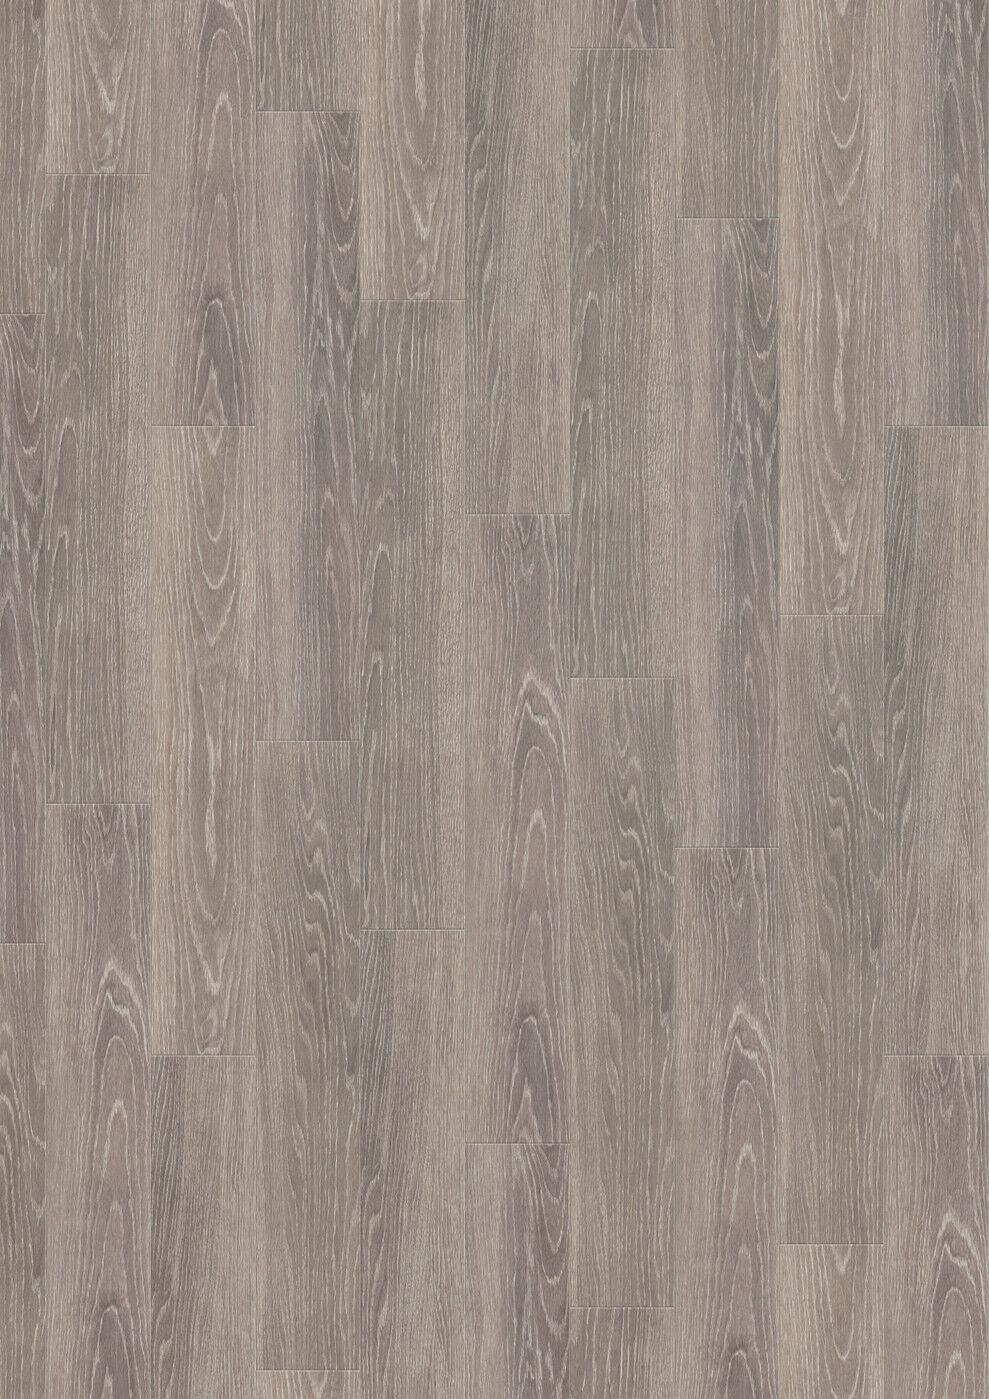 EXPONA Commercial Vinylboden / Designboden 4082 (Grau Limed Oak) 0,55er